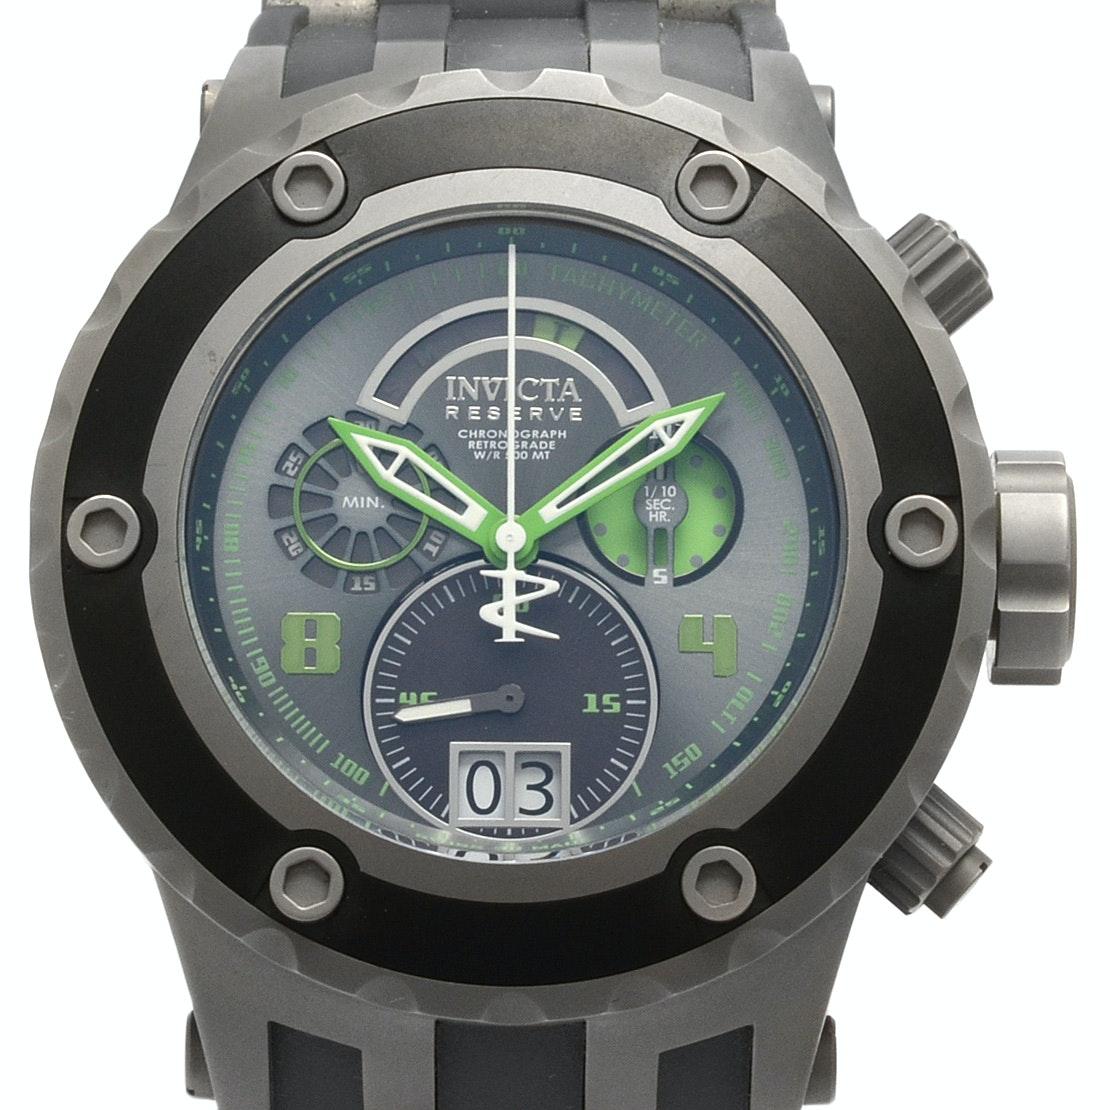 Invicta Reserve Sub Aqua Chronograph Wristwatch